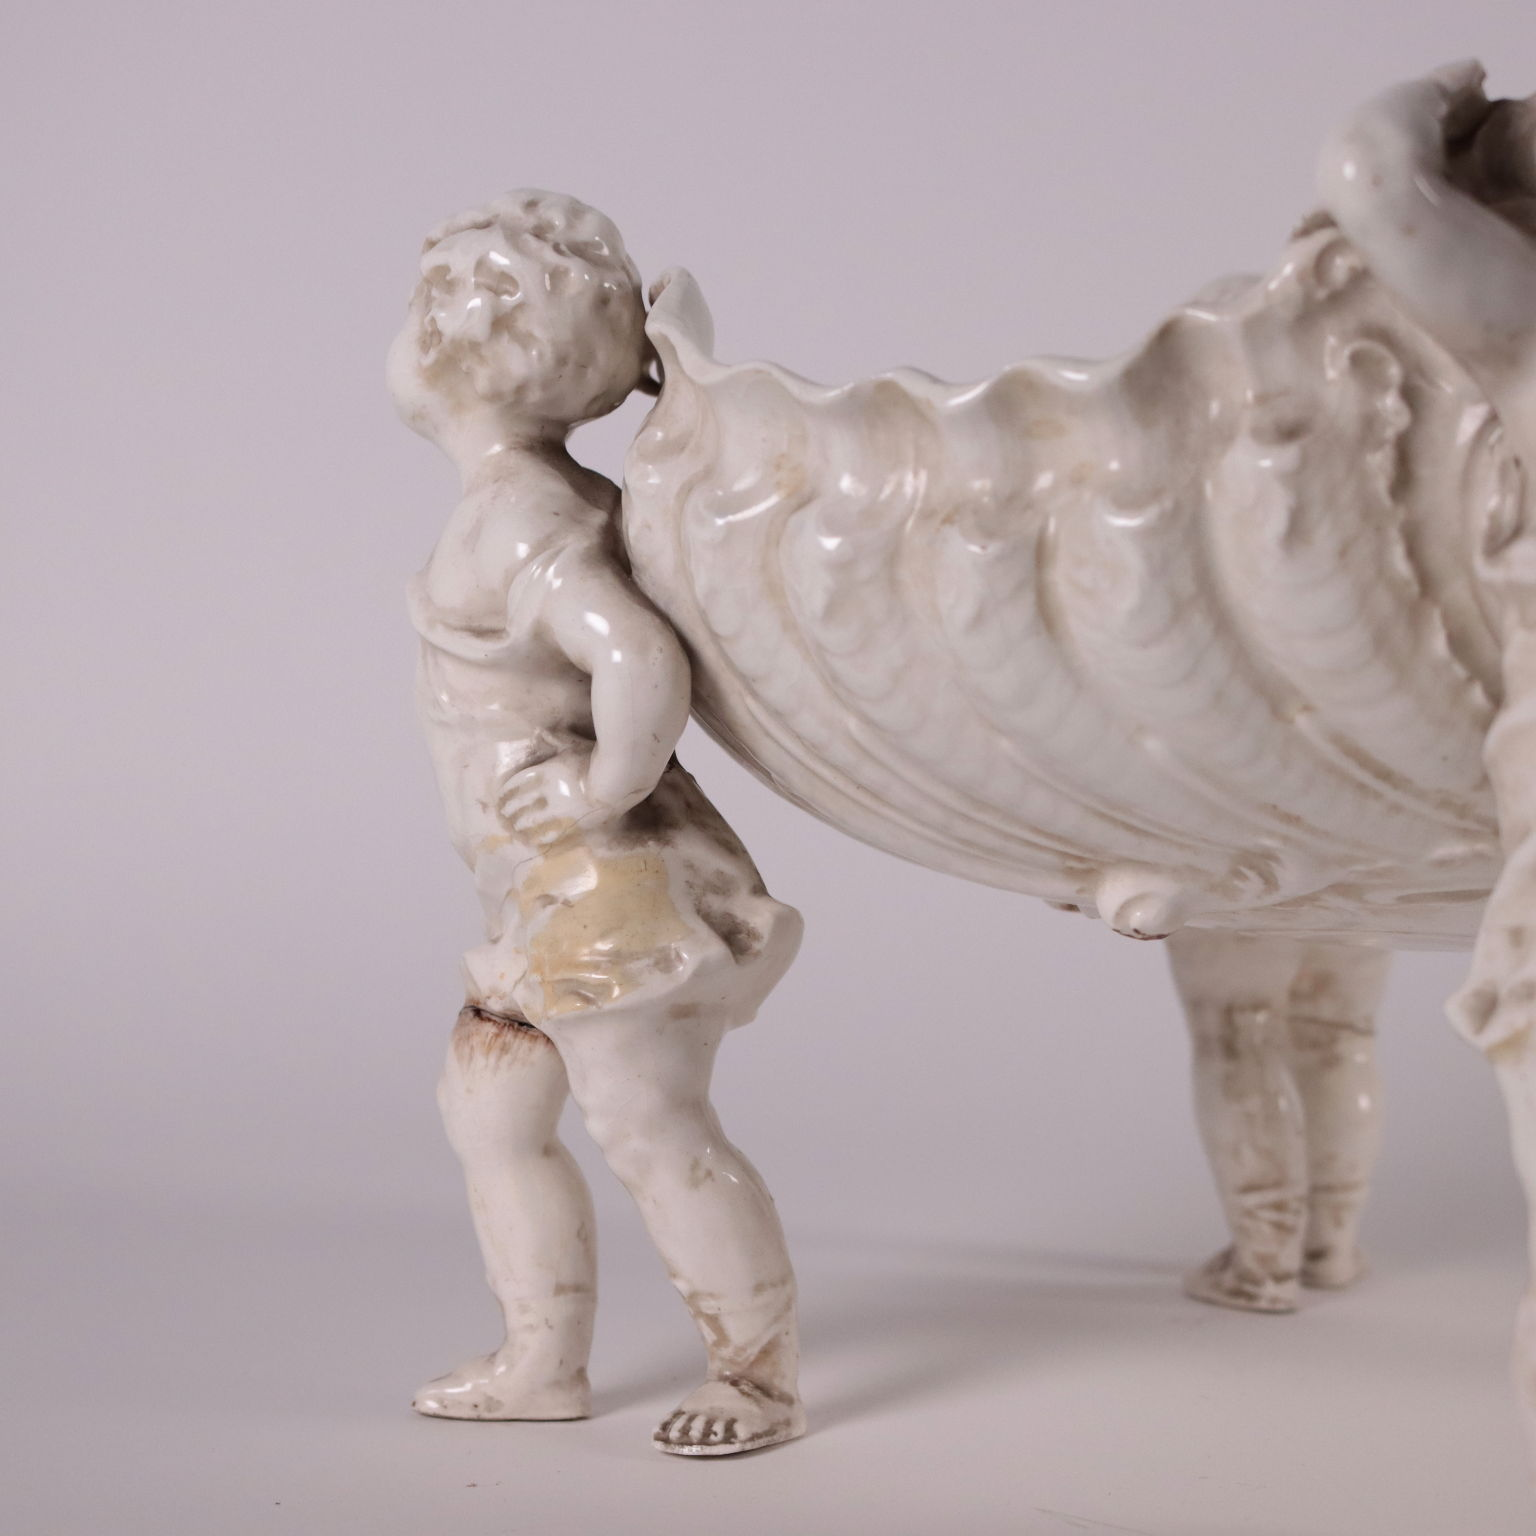 Alzatina in Ceramica Maiolicata - Ceramiche - Antiquariato ...